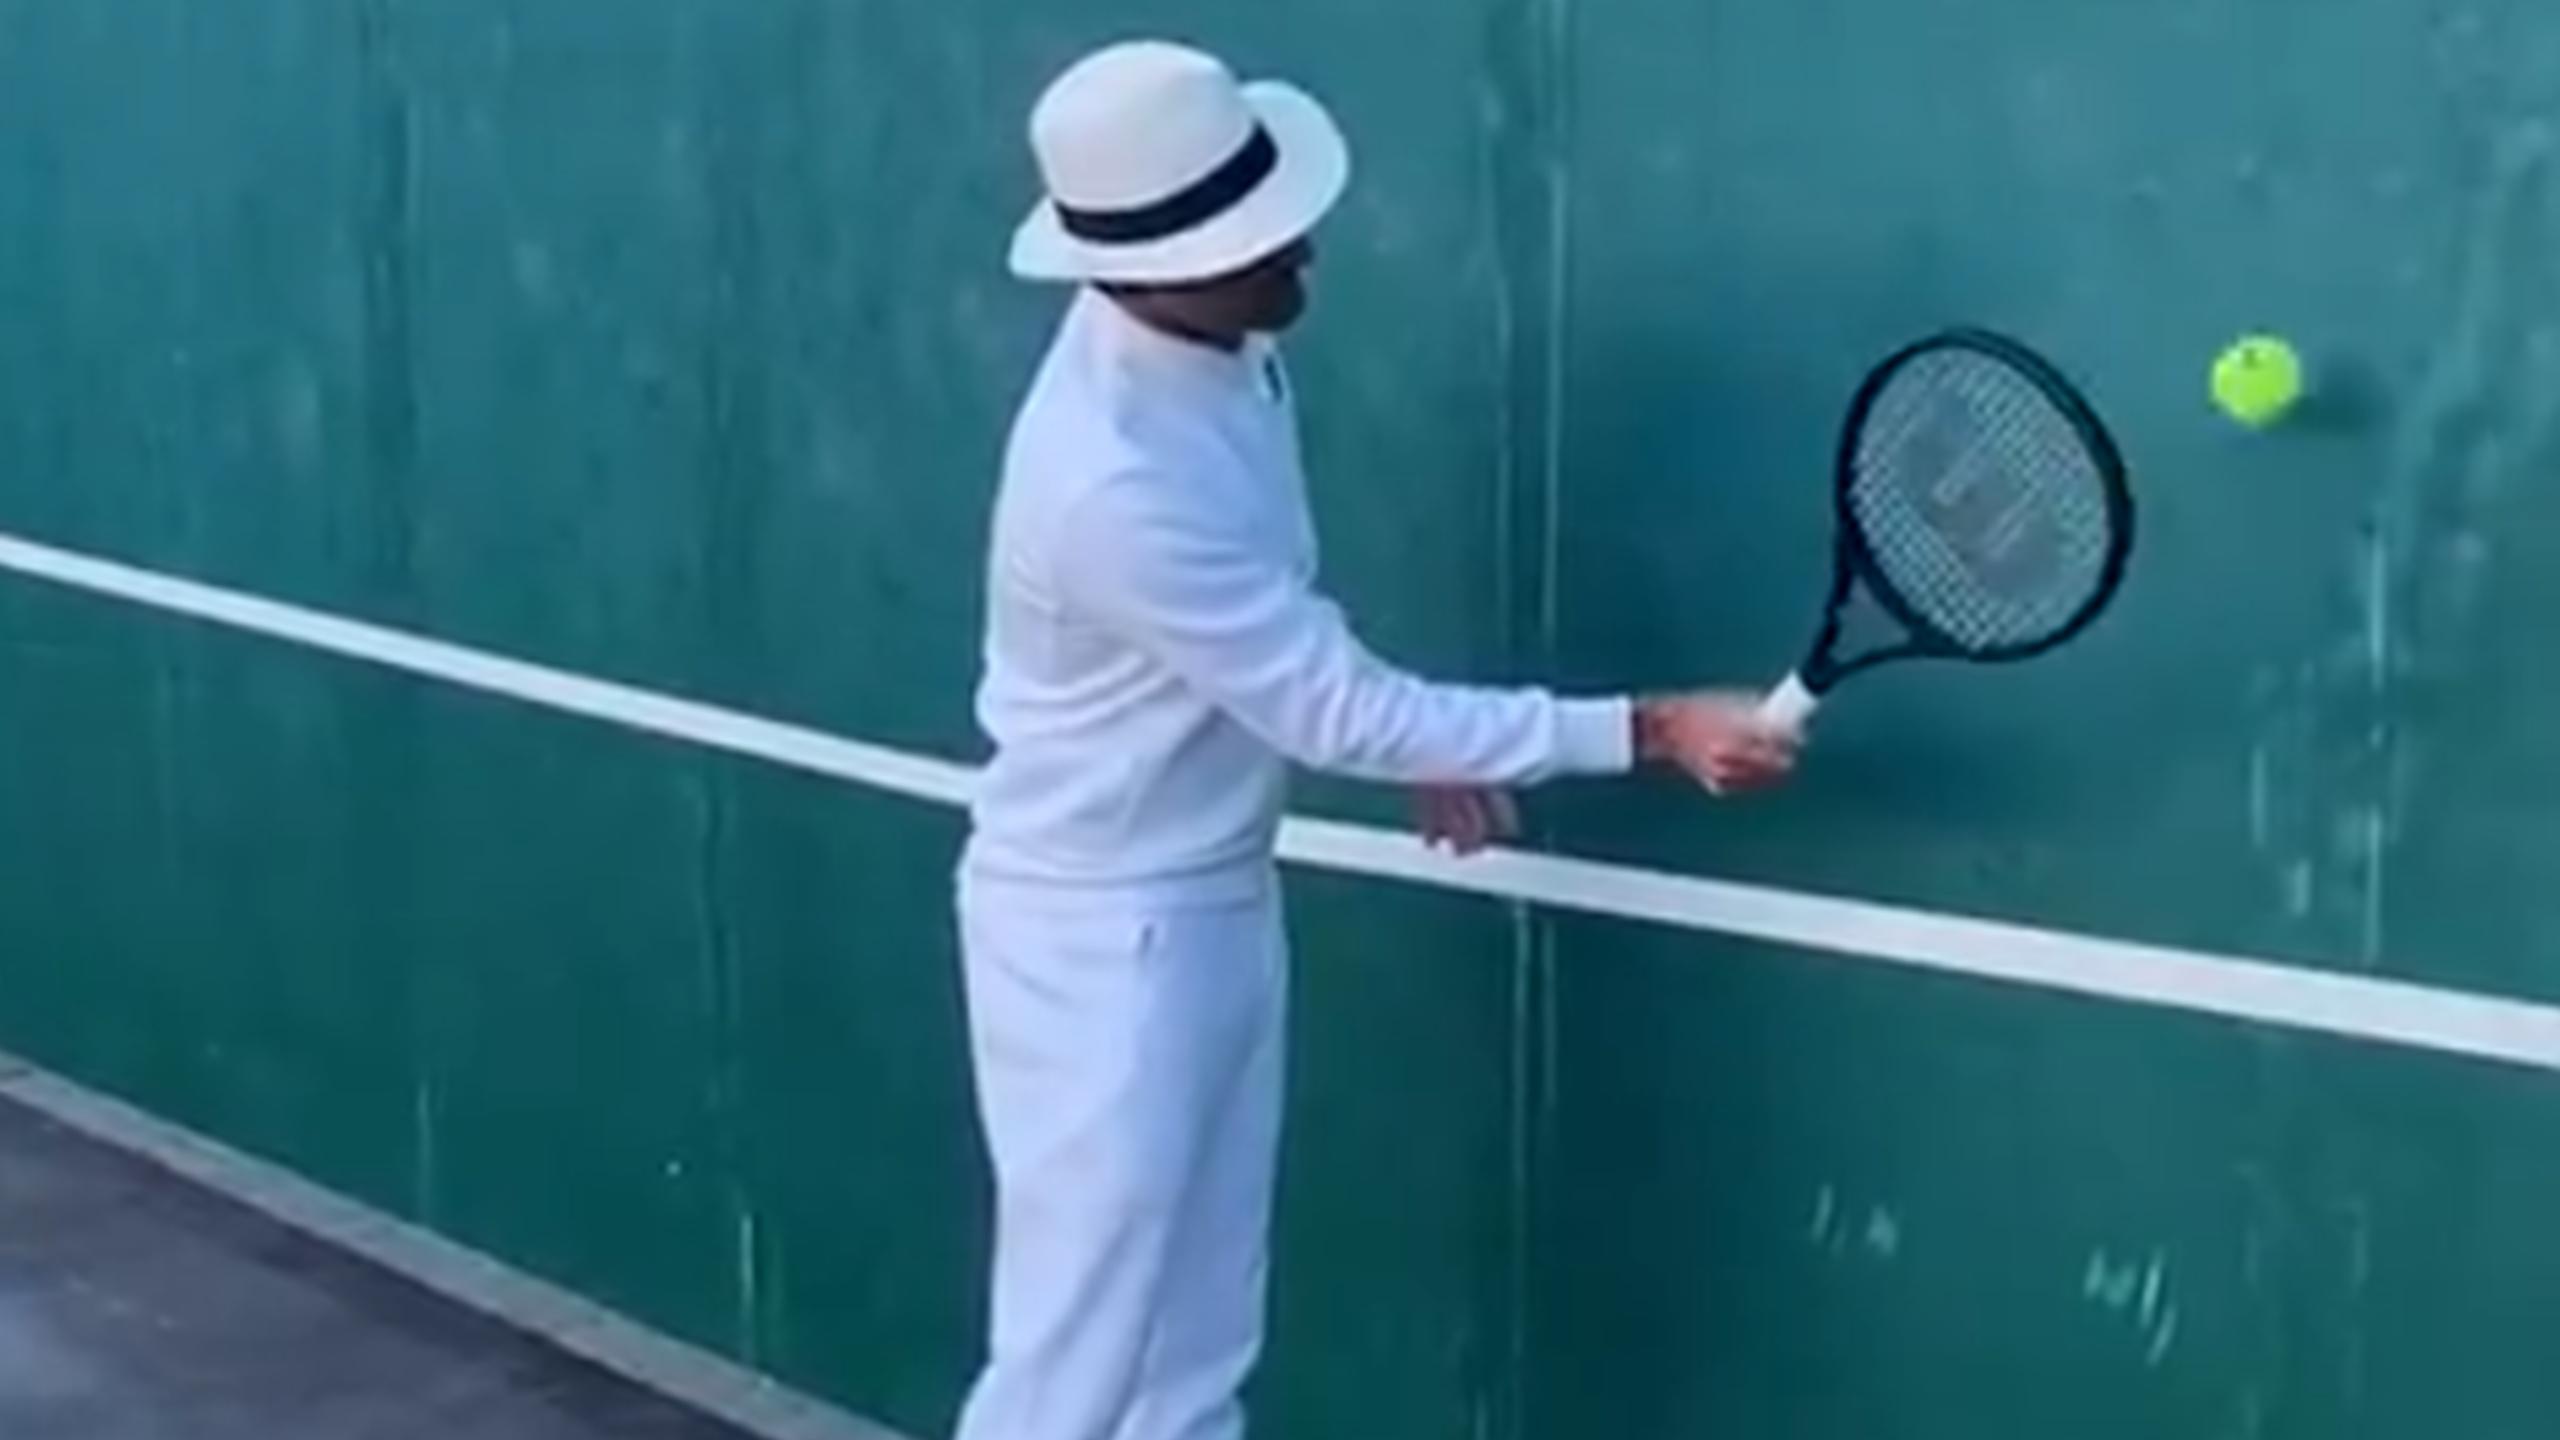 Tennis News Roger Federer Isolation Volley Challenge Goes Viral On Social Media Eurosport